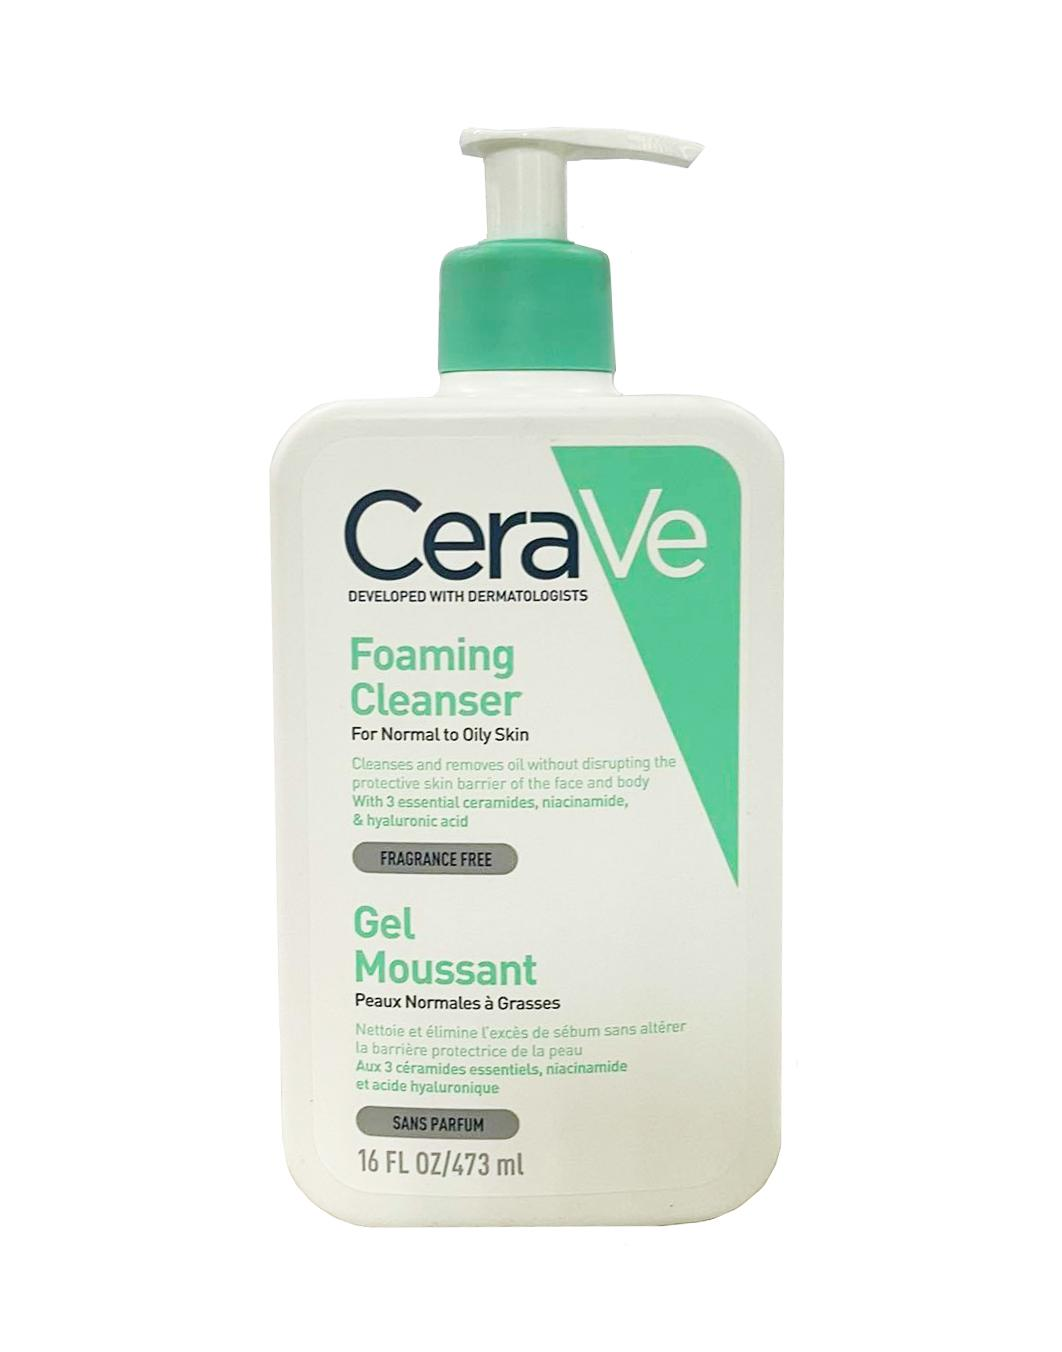 Sữa rửa mặt CeraVe Foaming Facial Cleanser loại 473ml